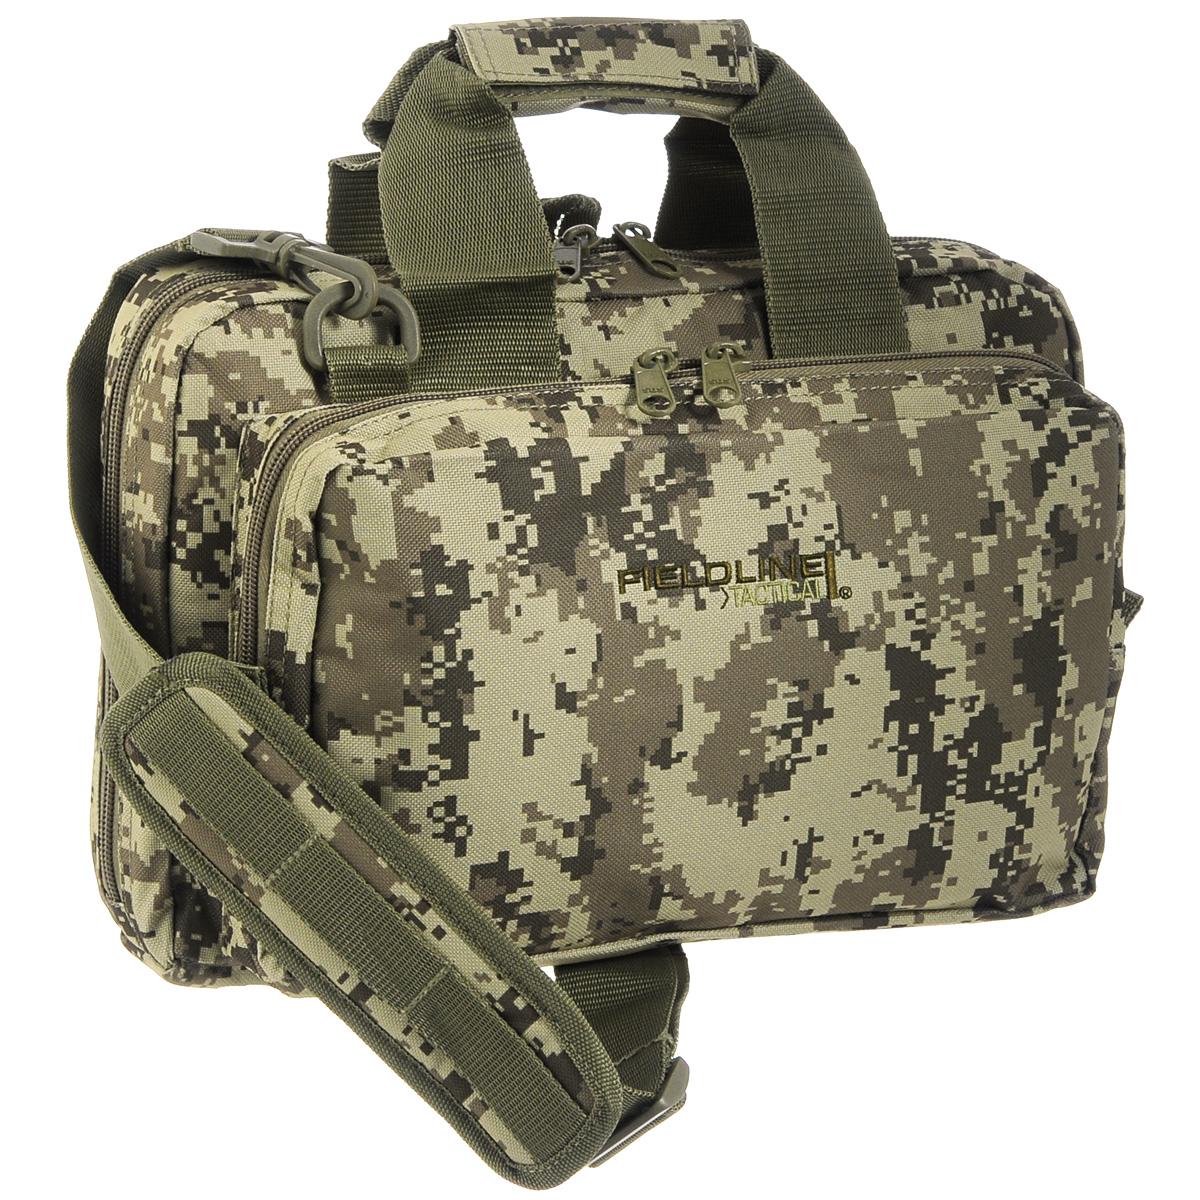 "Сумка для оружия Fieldline ""Shooters Bag"", цвет: хаки, 12 л"